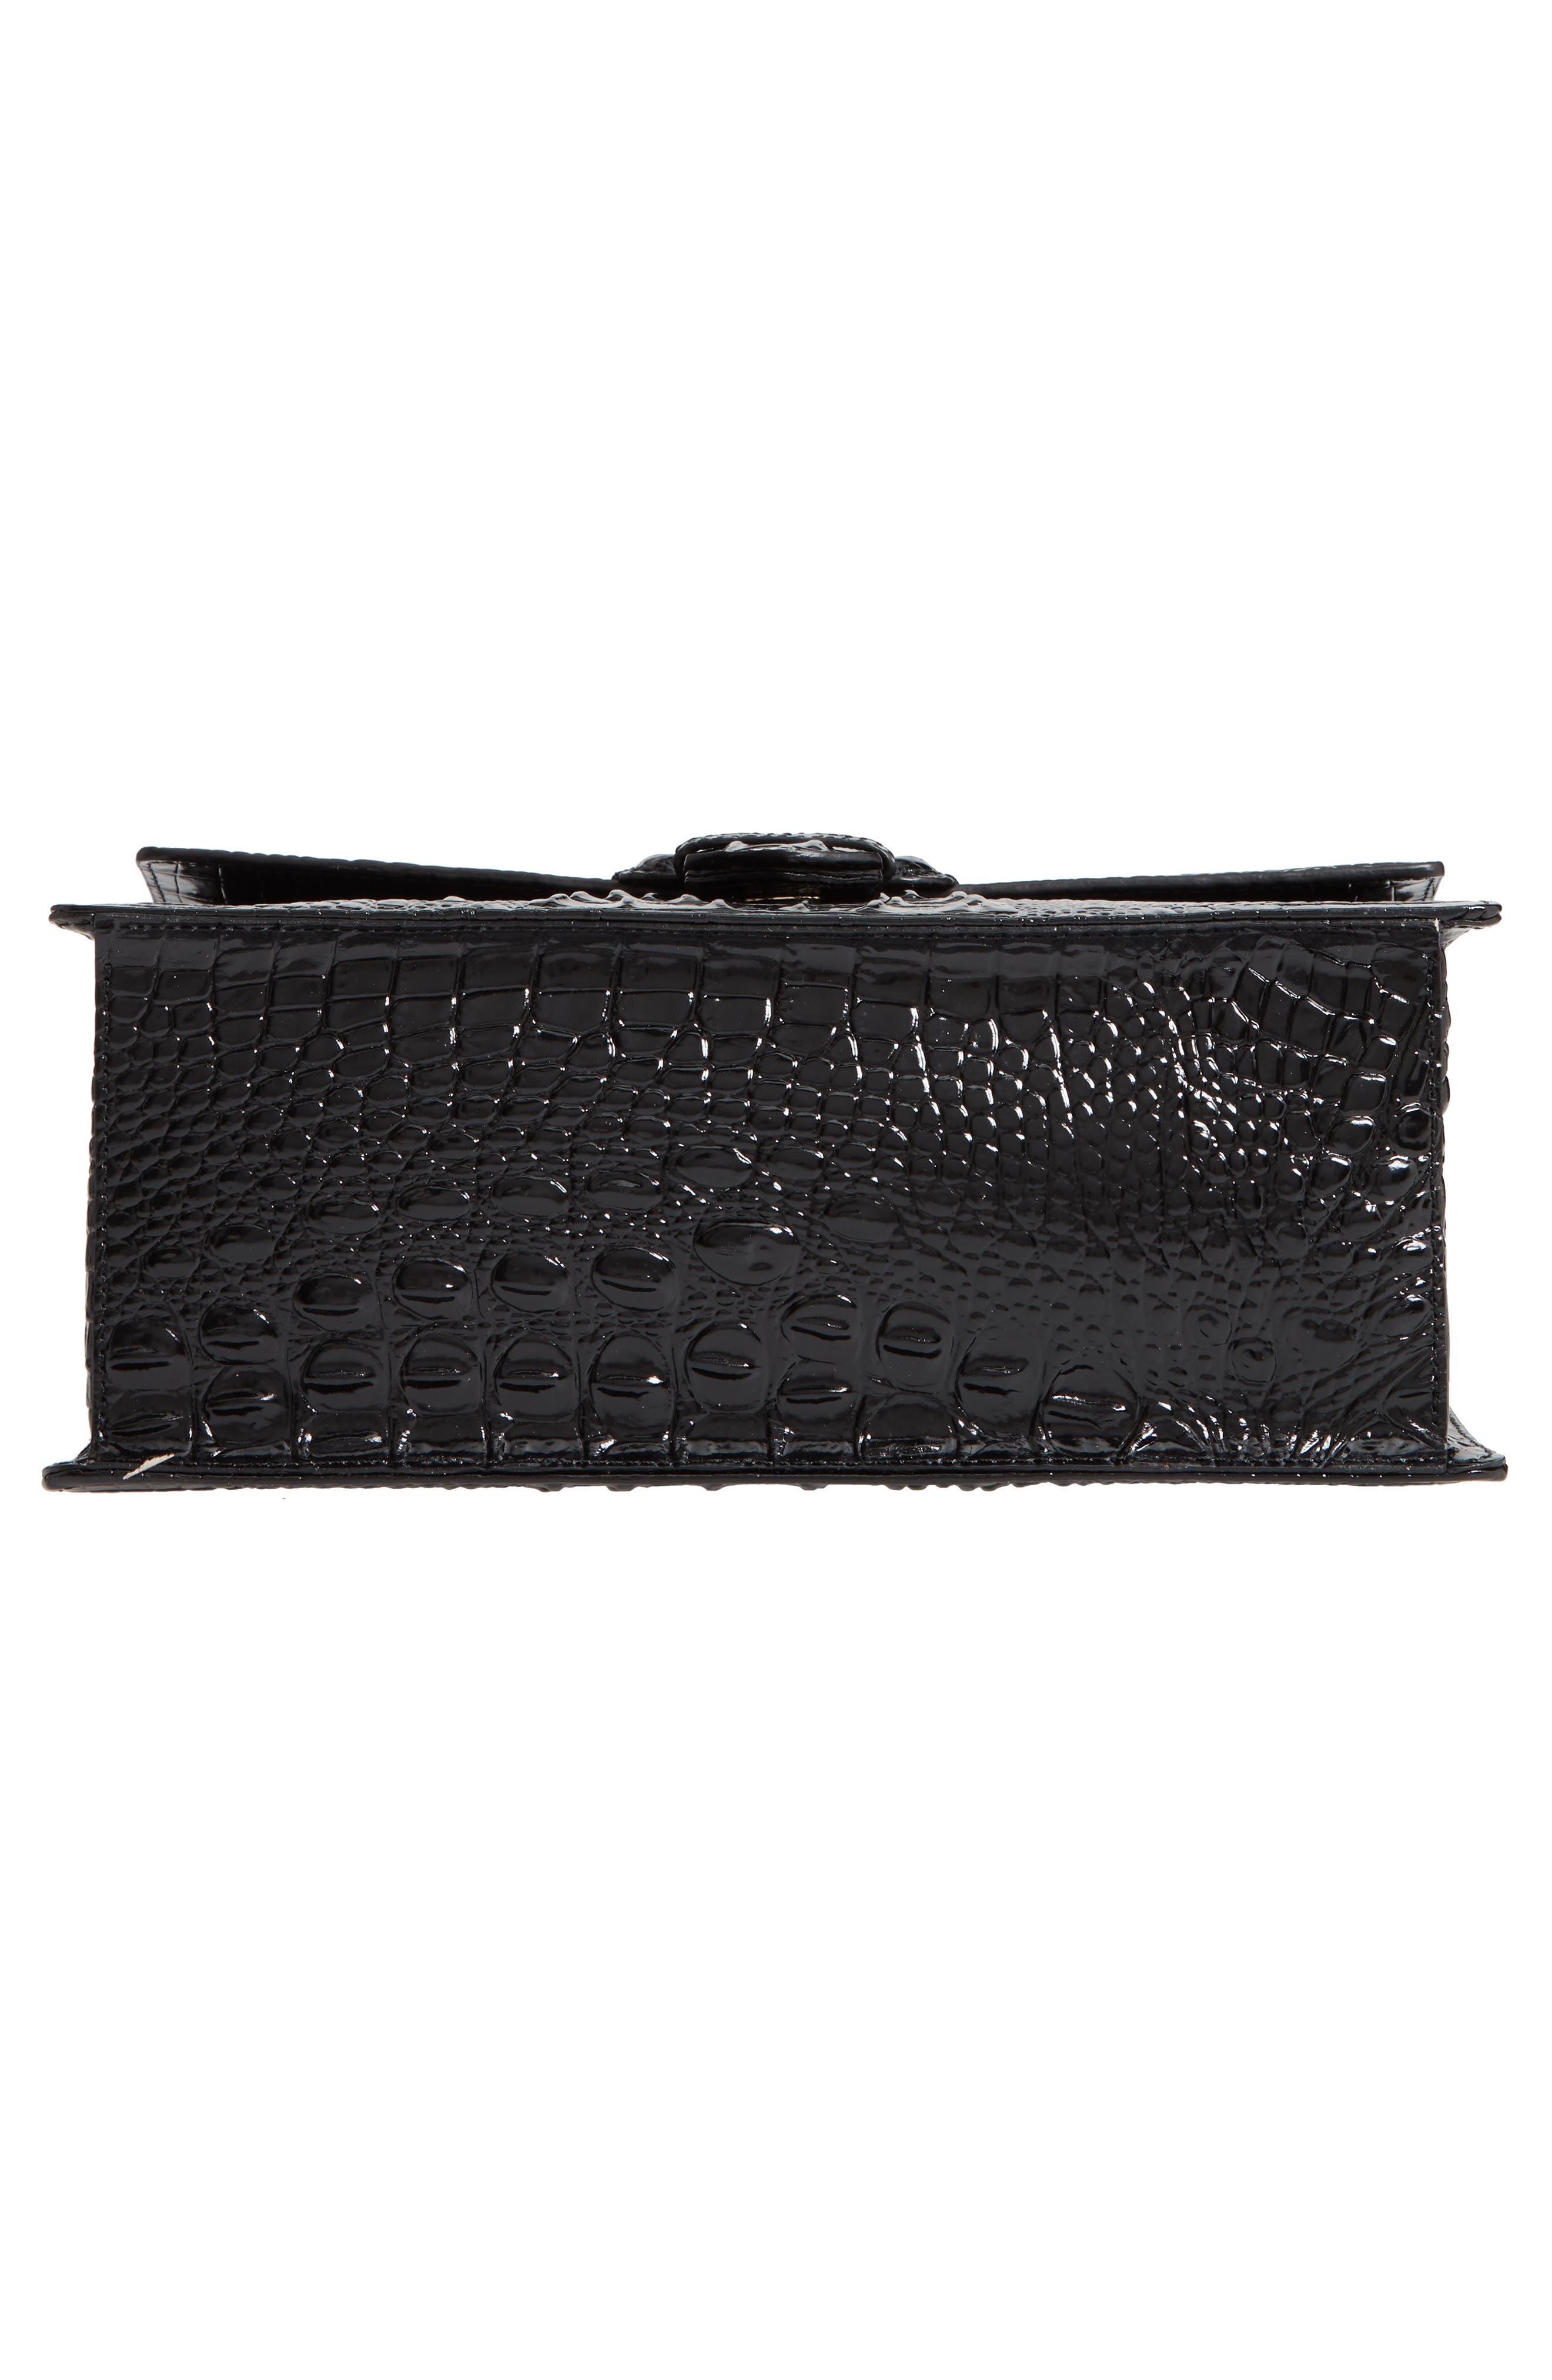 Medium Francine Croc Embossed Leather Satchel,                             Alternate thumbnail 6, color,                             BLACK